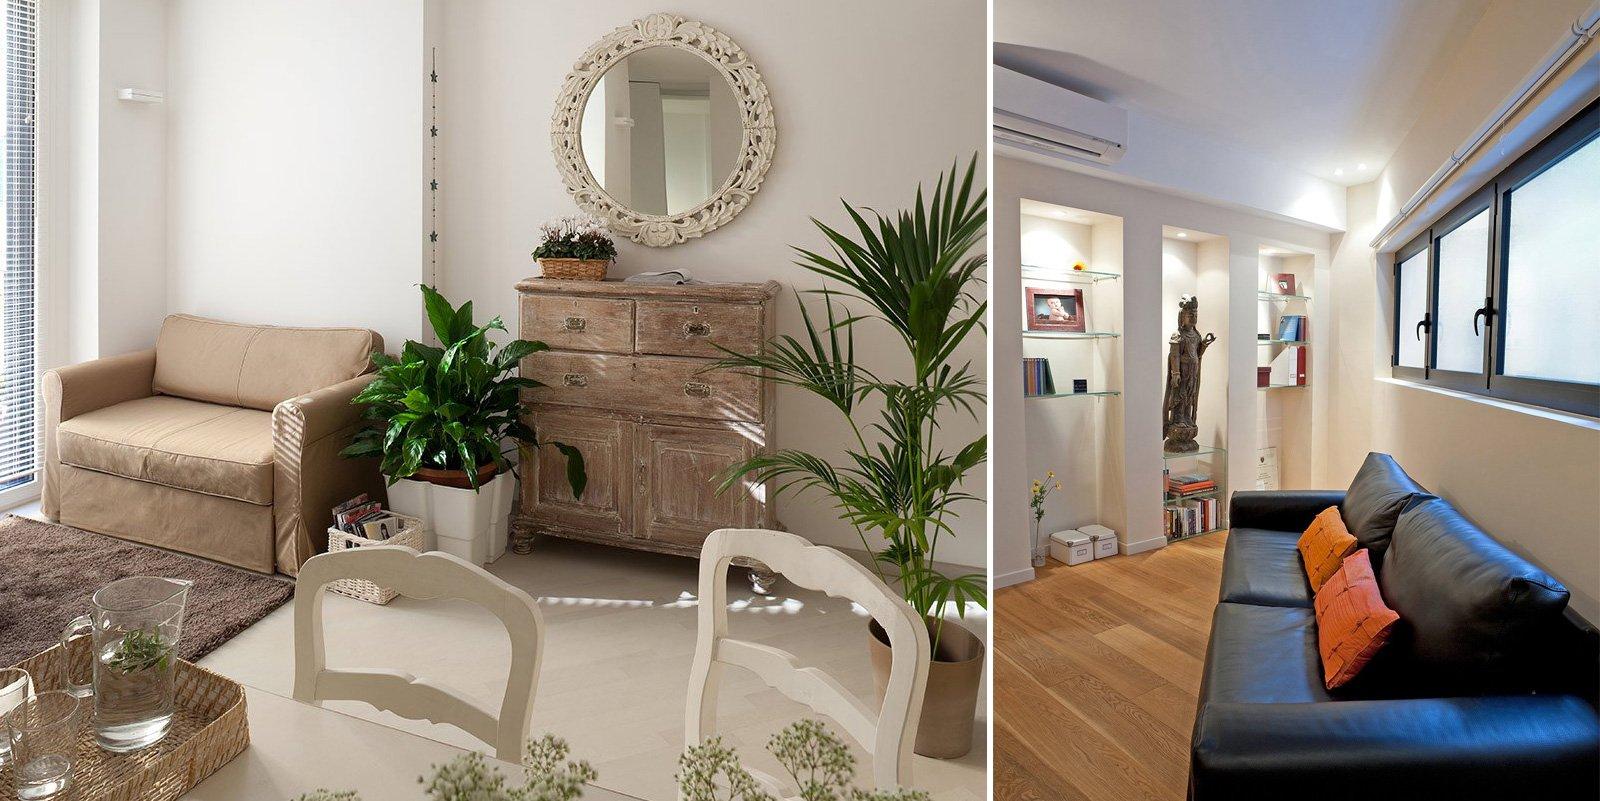 Case piccole due soluzioni diverse di 44 mq e 37 mq cose di casa - Casa ikea 50 mq ...